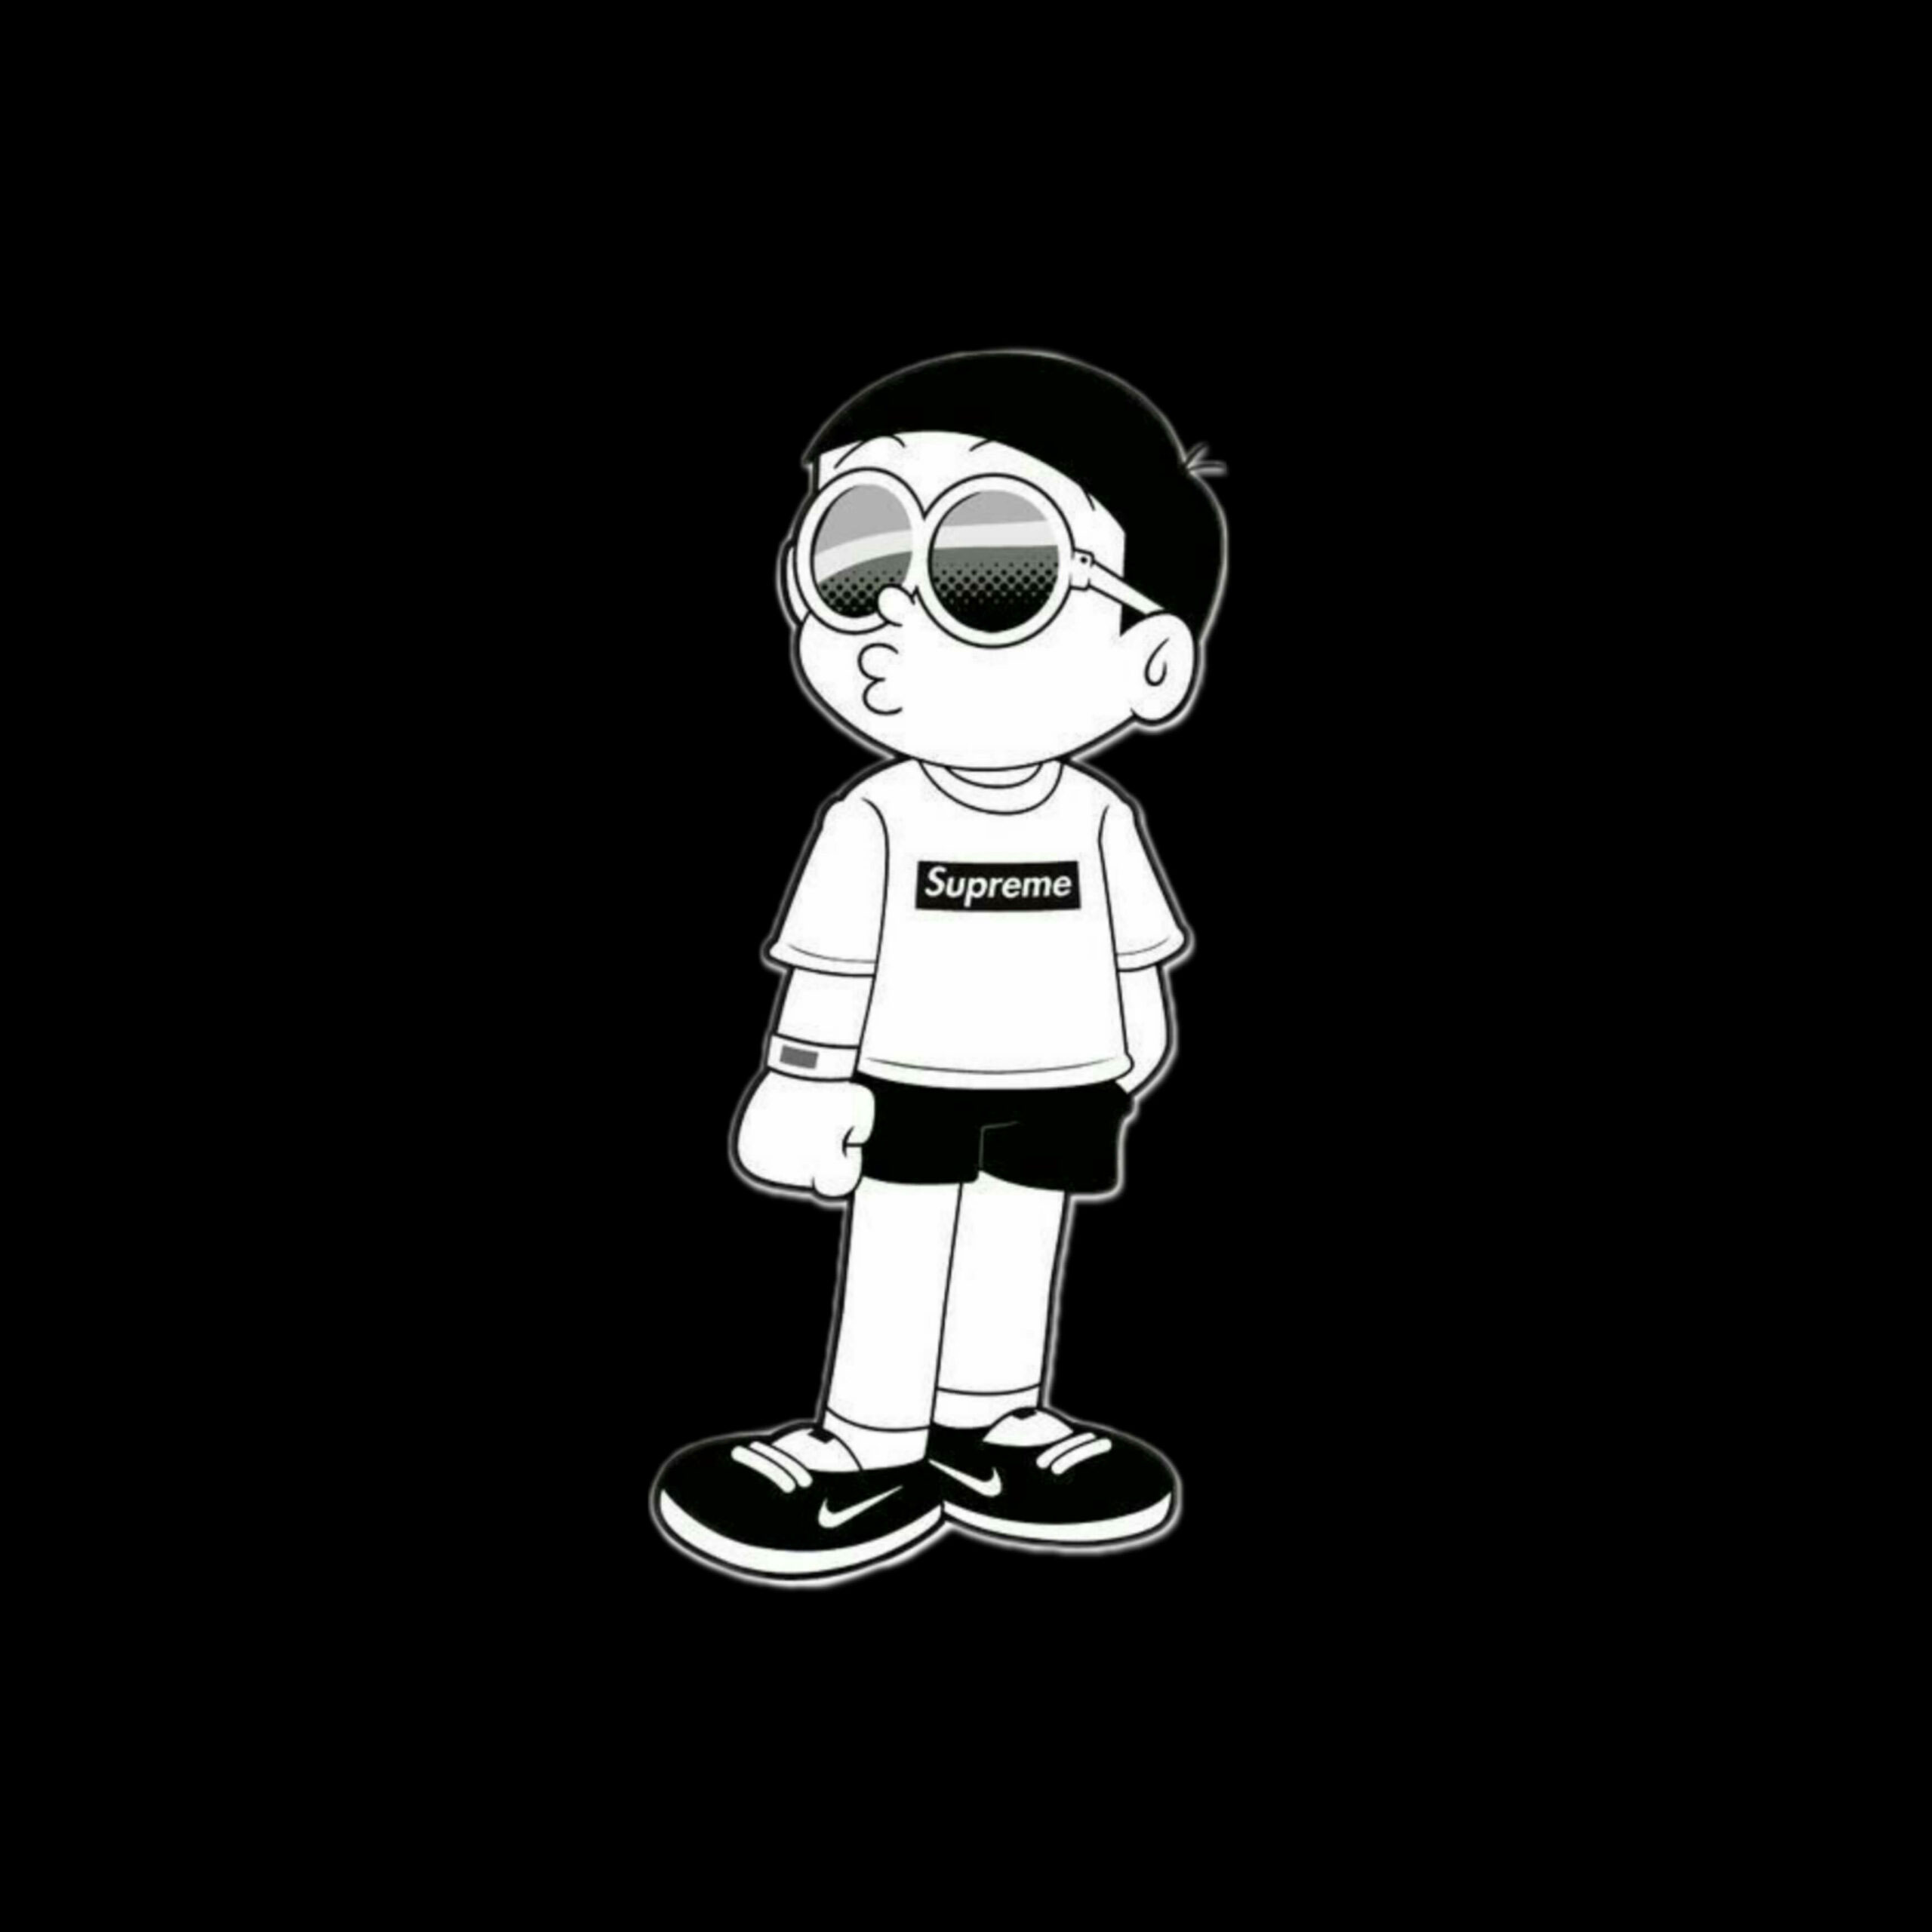 boy New Cool Whatsapp Dp Images 1